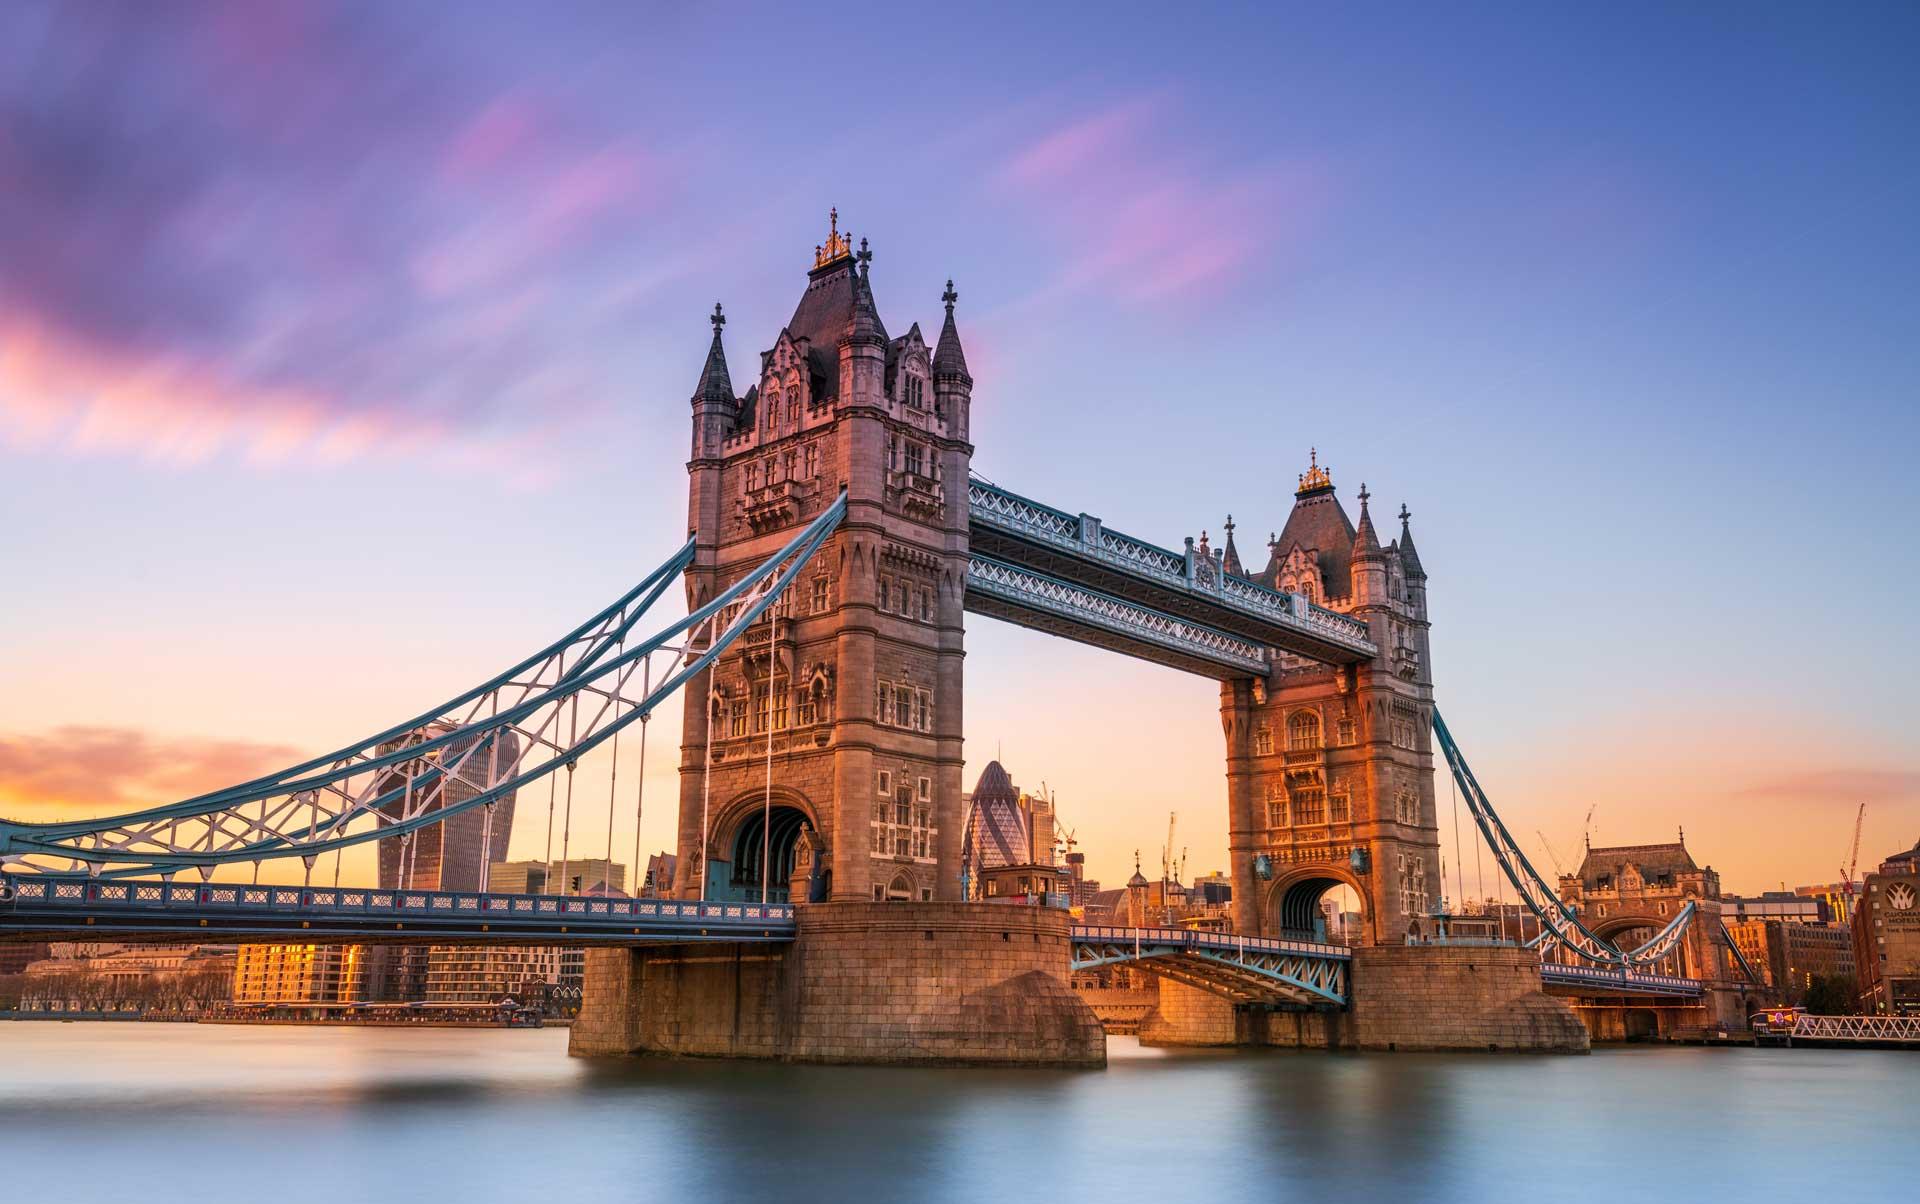 London Bridge World Championship City Landscape